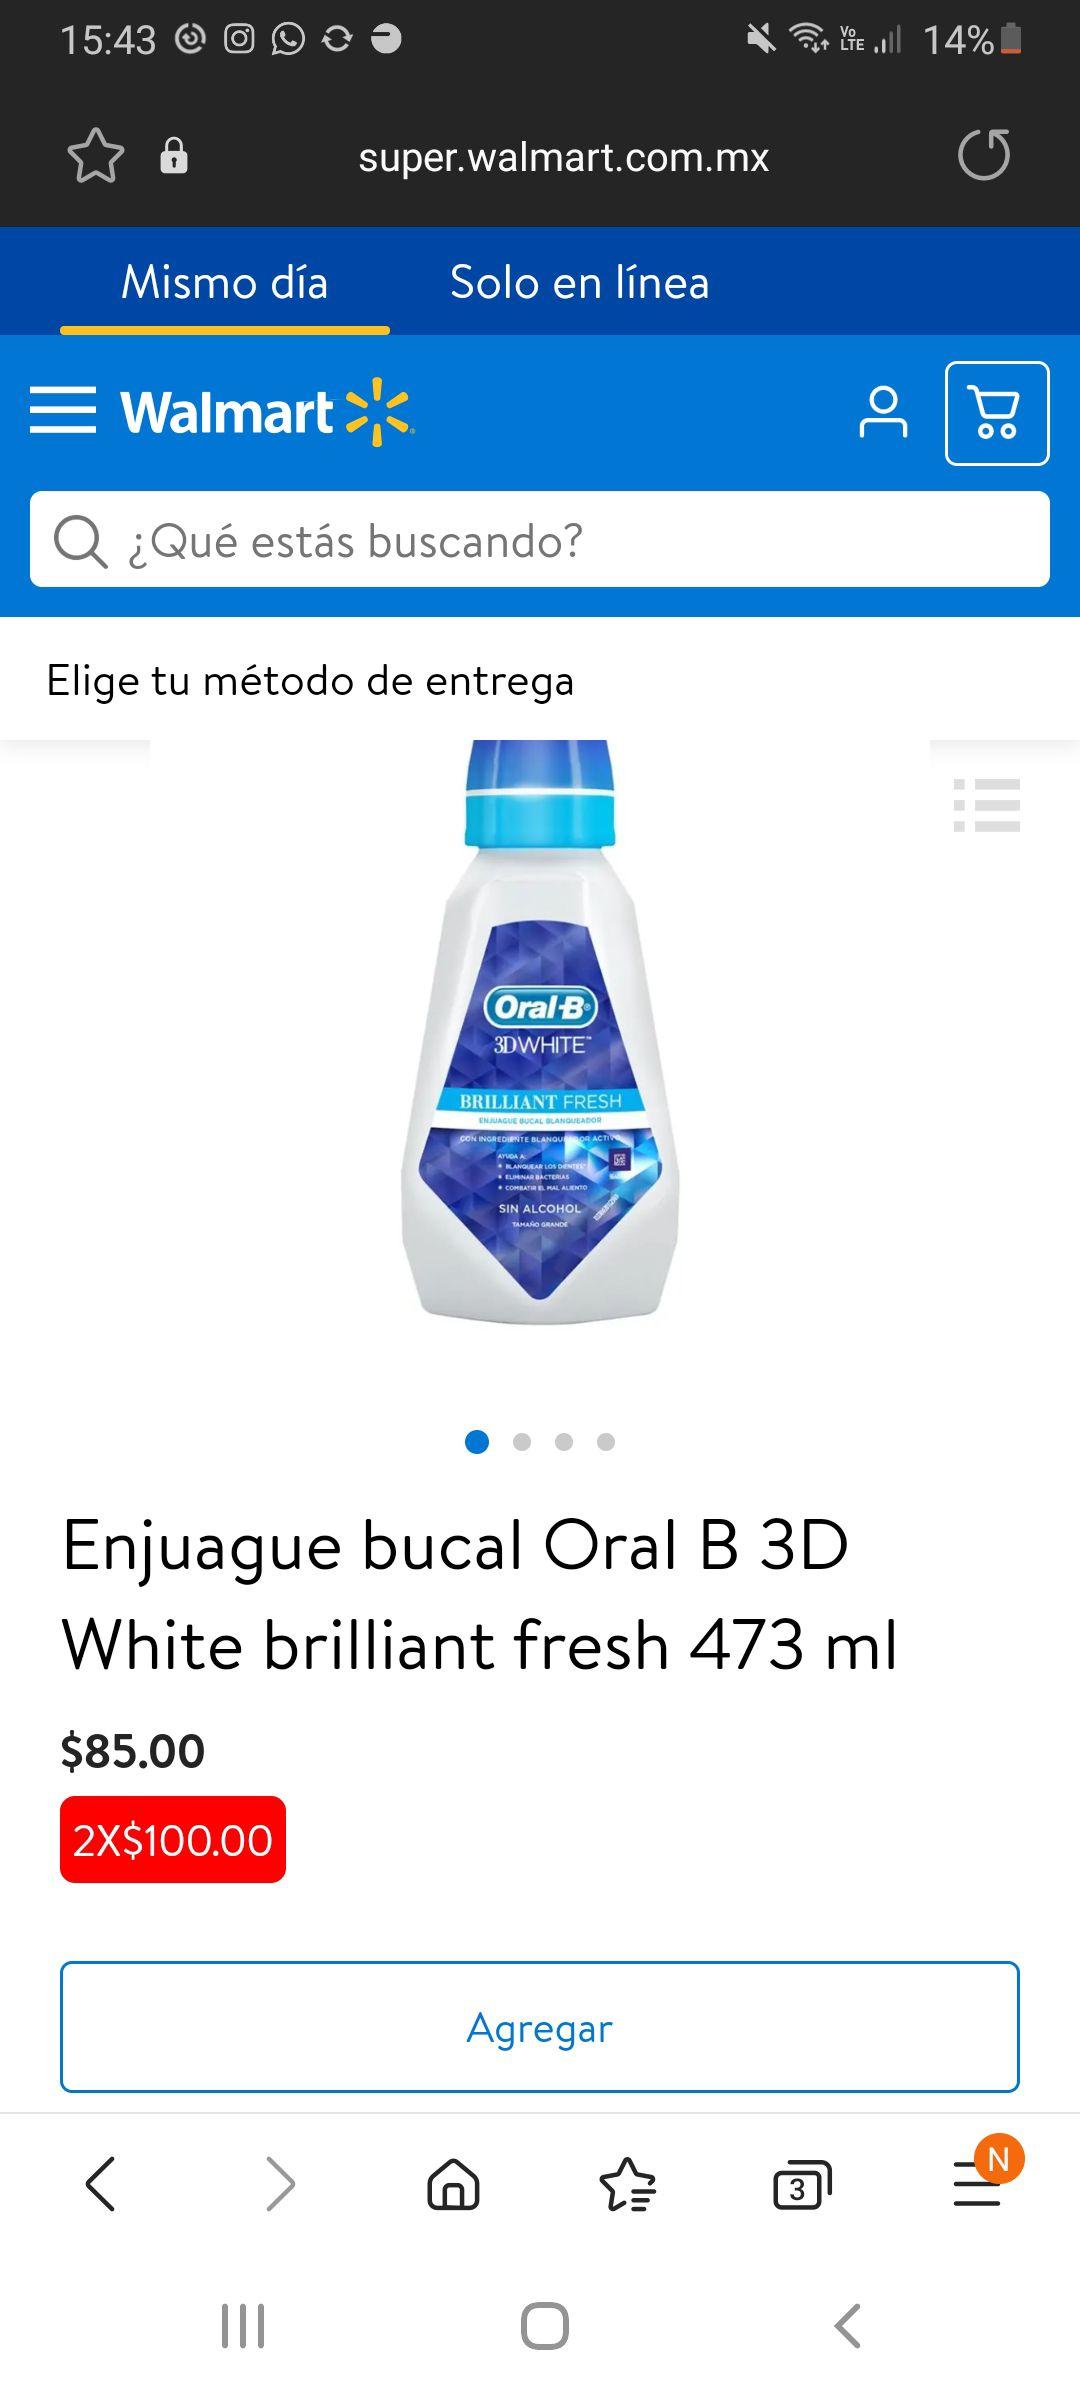 2 Enjuague bucal Oral B 3D White brilliant fresh por $100